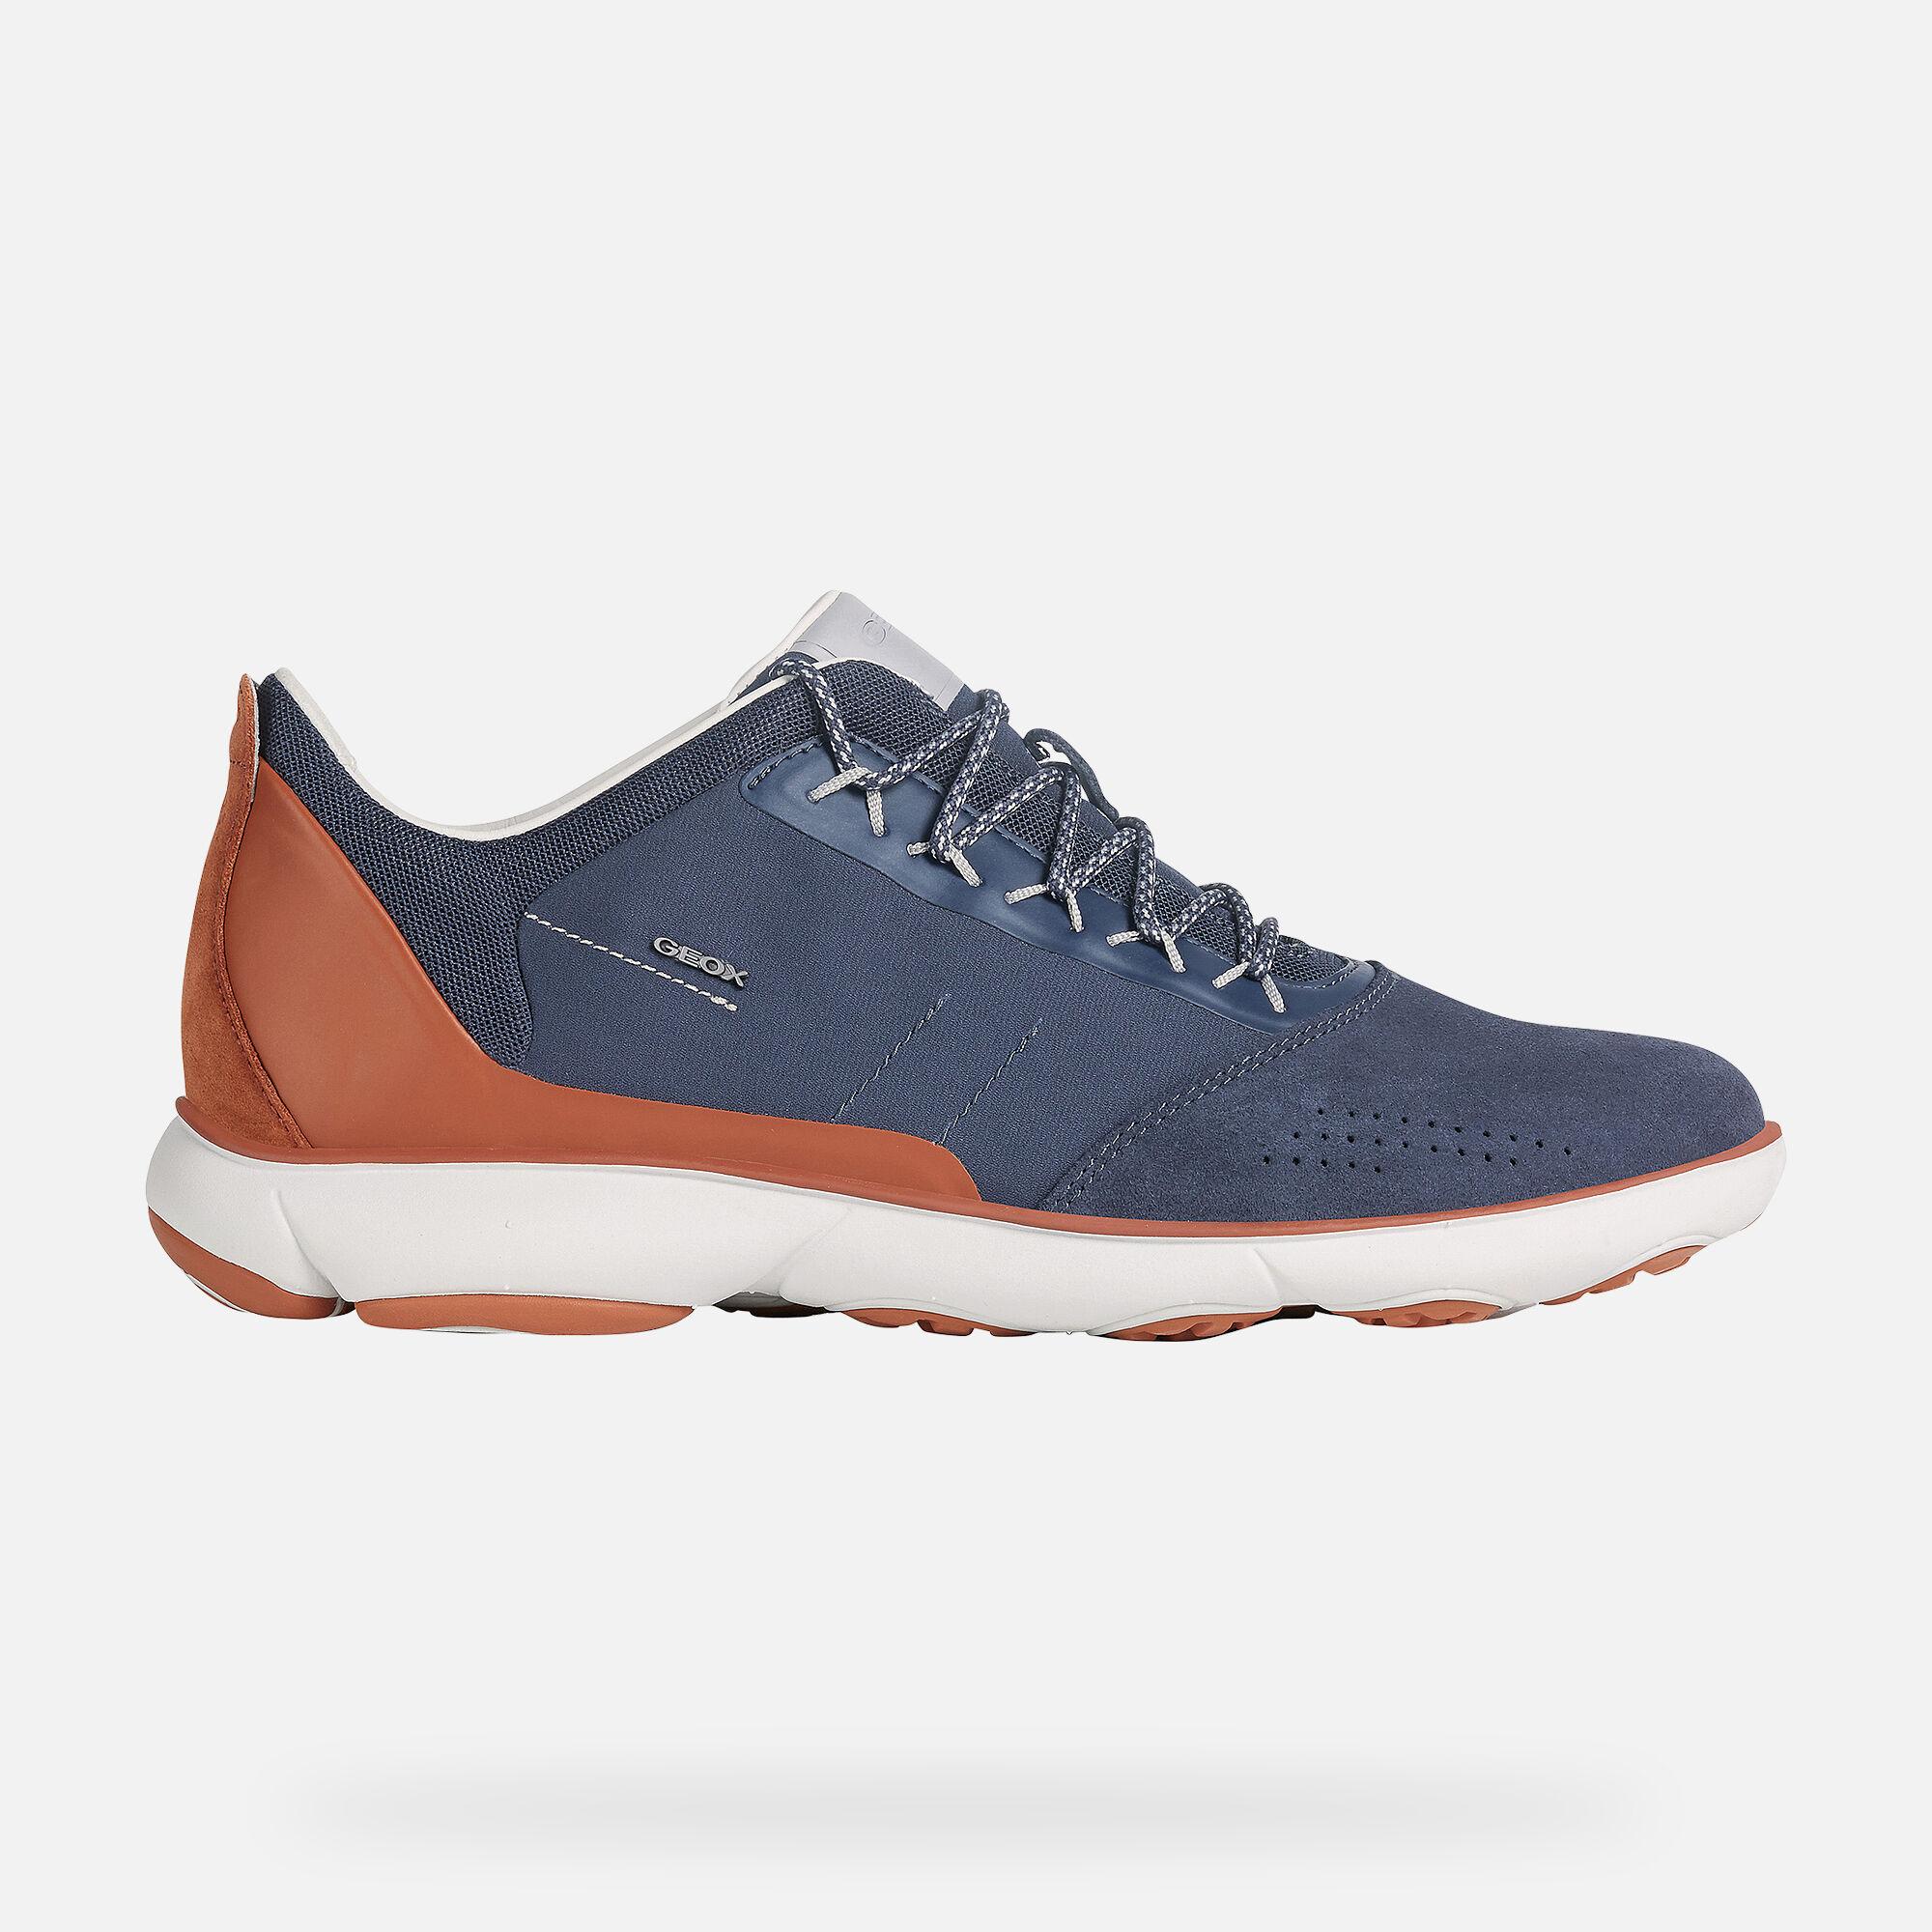 Geox NEBULA Man: Avio Sneakers | Geox